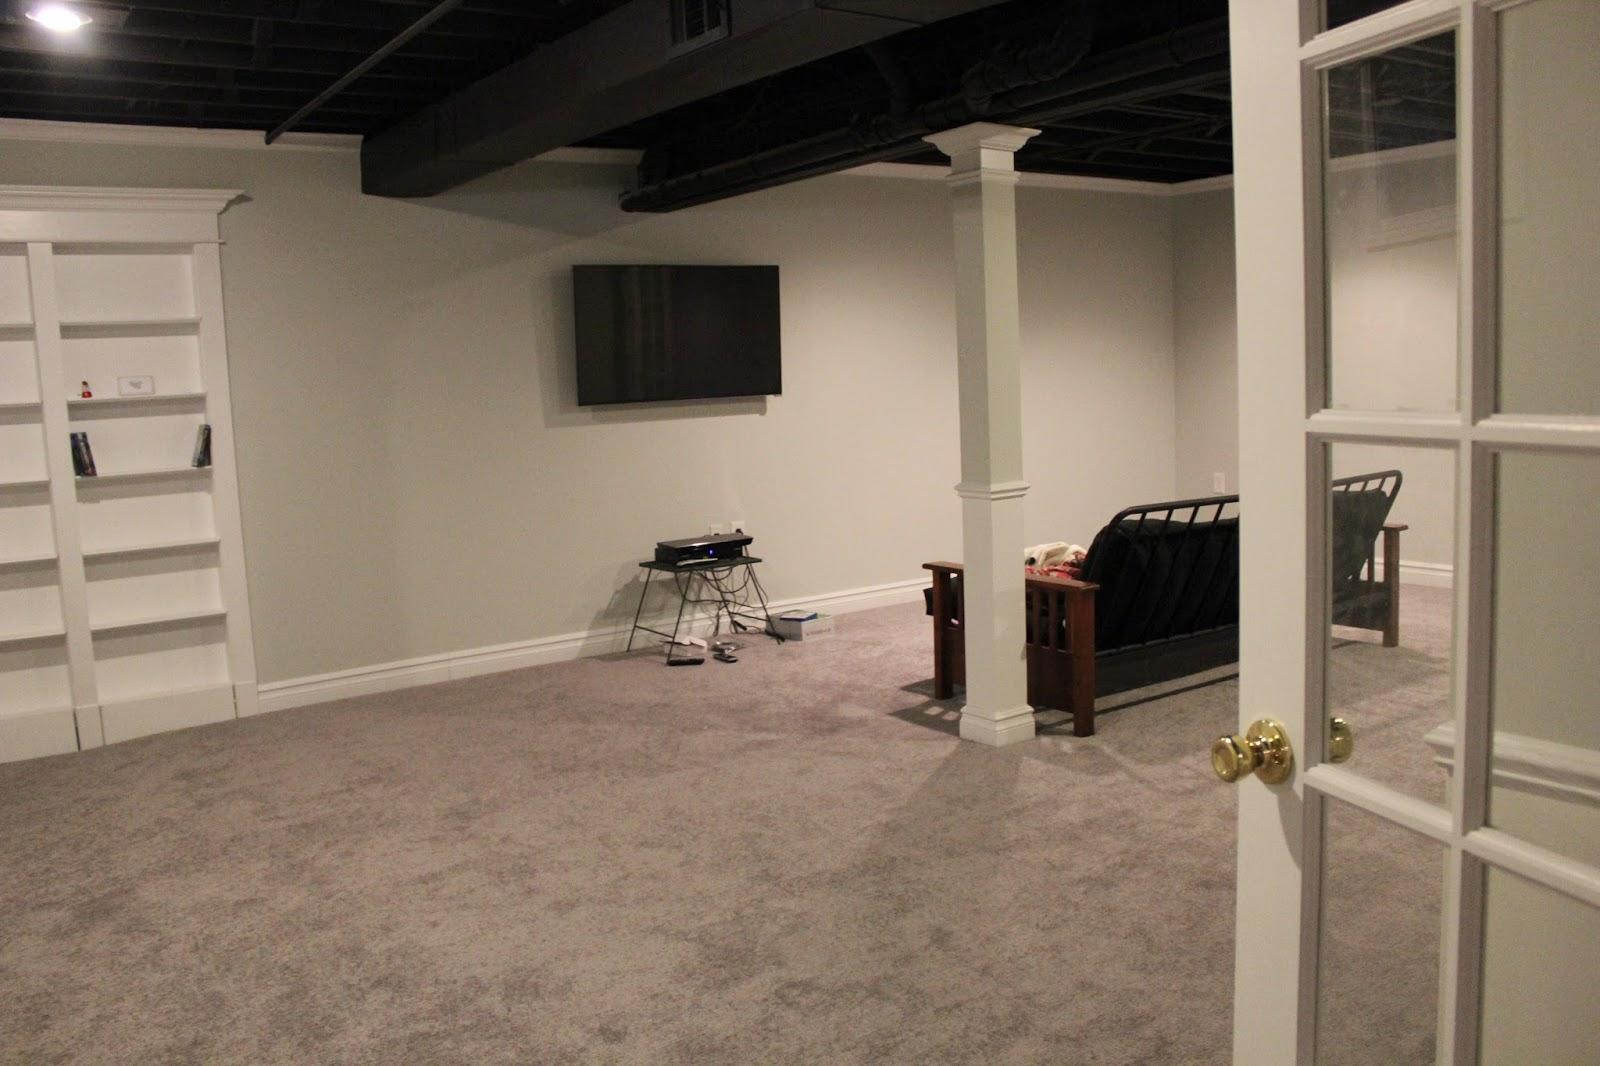 exposed basement ceiling lighting ideas. exposed basement ceiling lighting ideas e